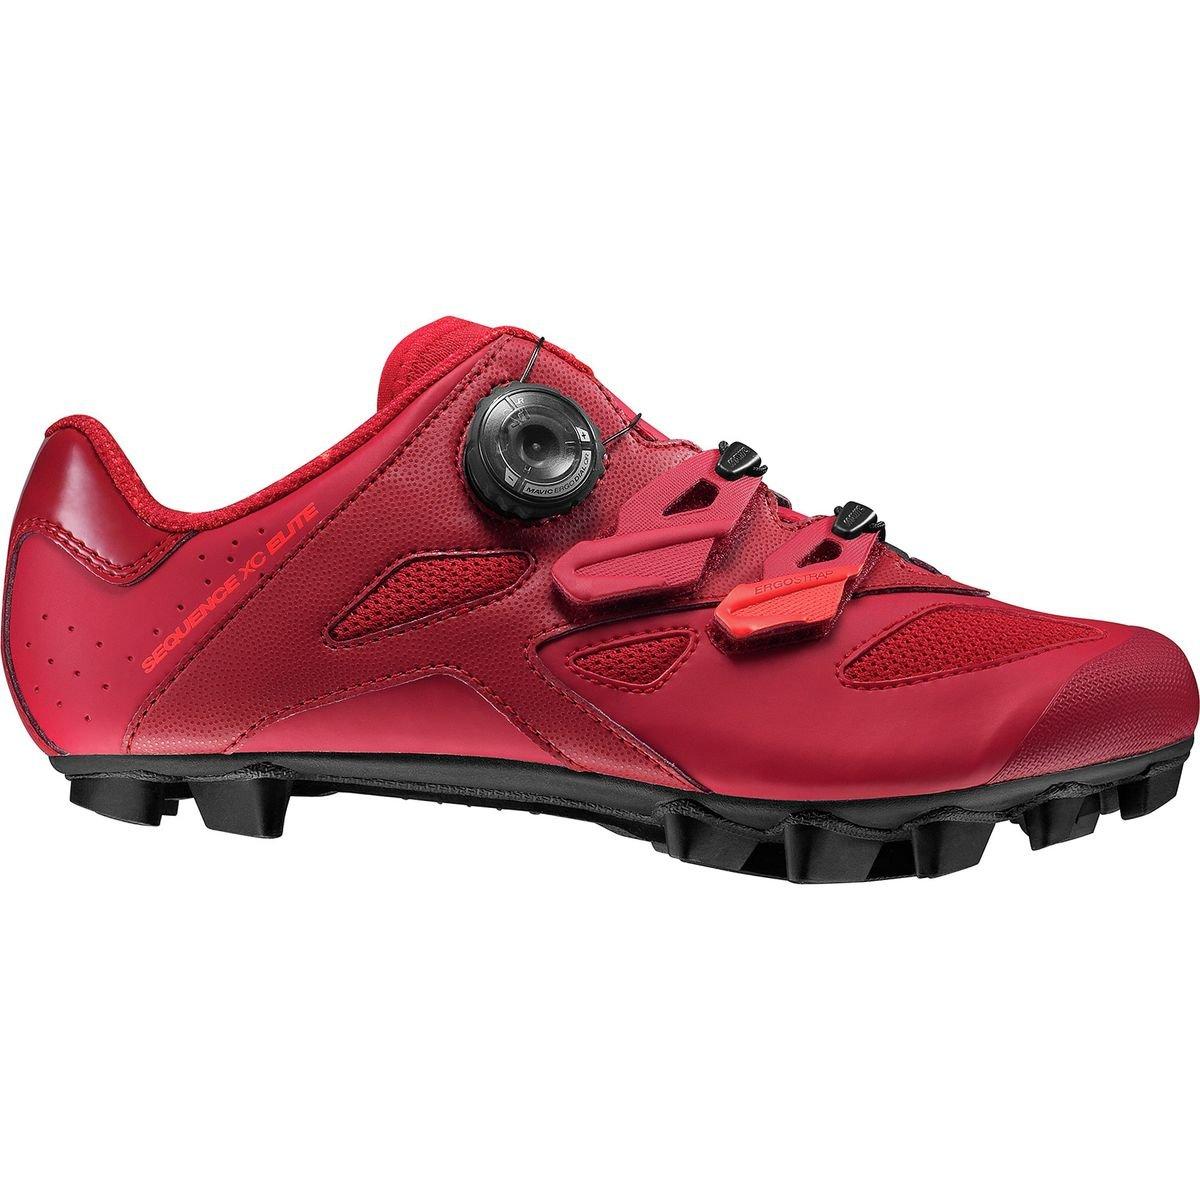 Mavic レディース シーケンス XC エリート シューズ US 9.0/UK 7.5 Jester Red/Fiery Coral/Black B078S5111L